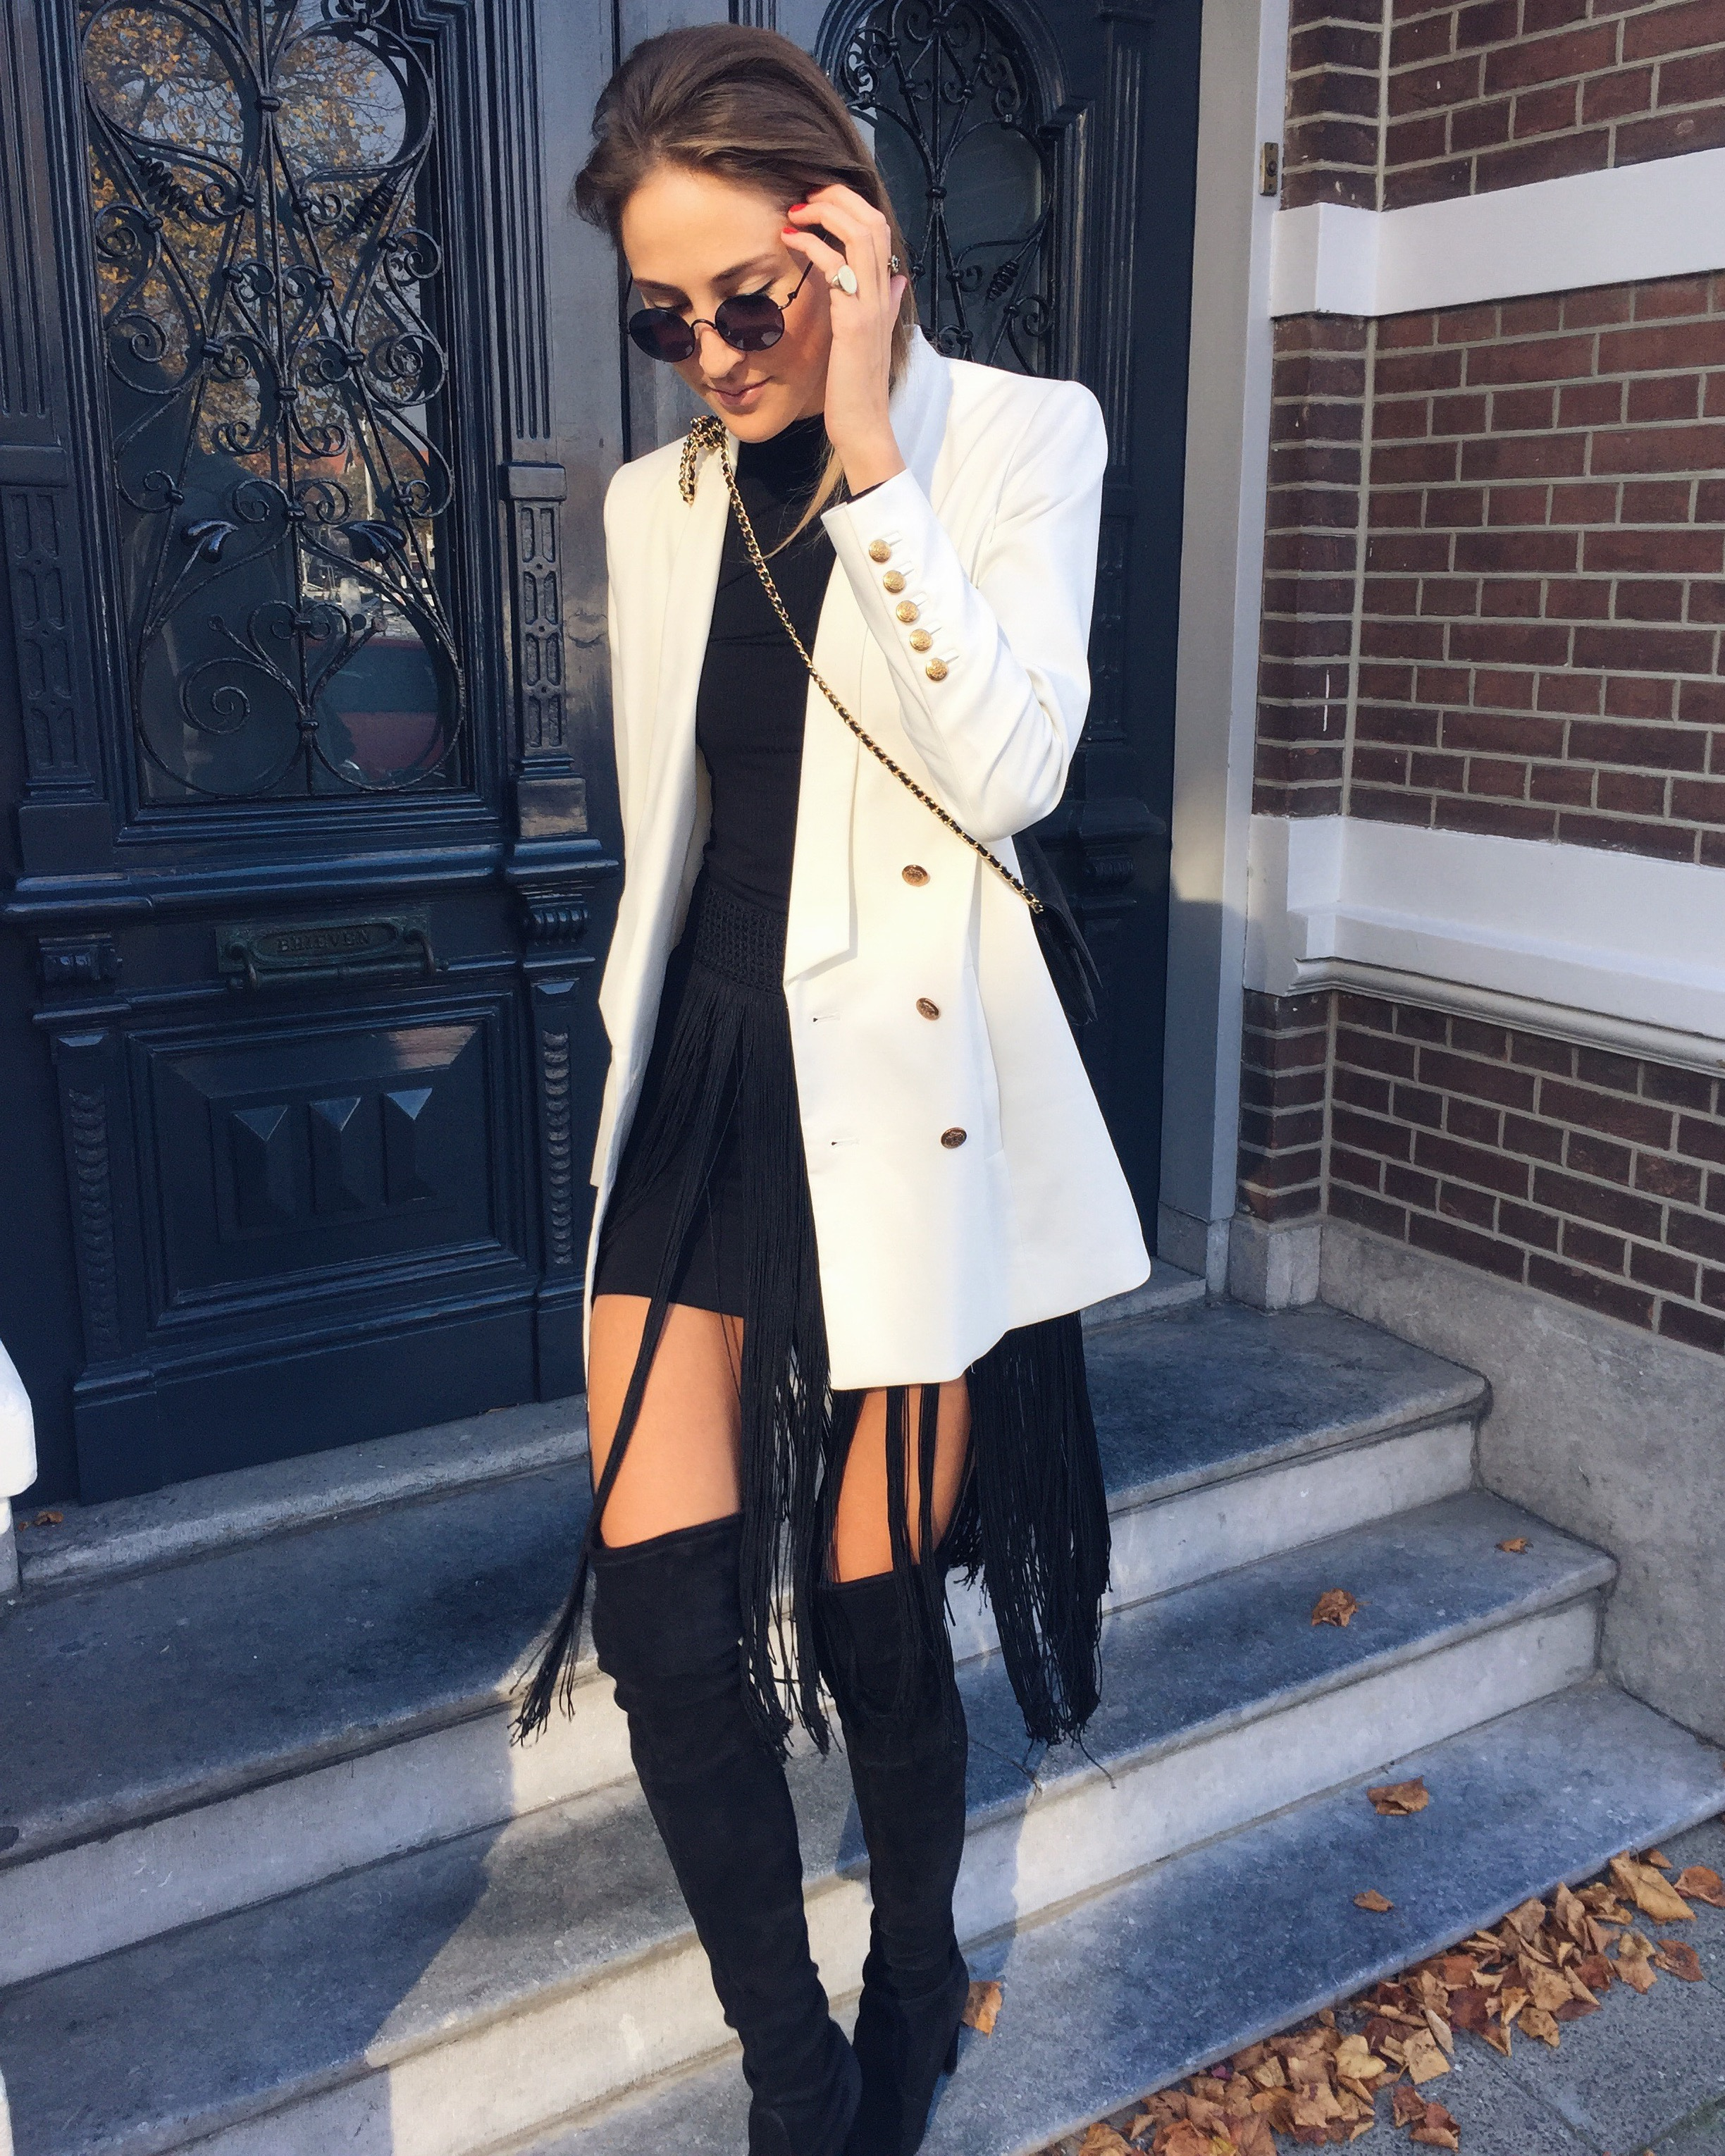 linda_tsetis_worlds_affair_sunday_ootd_style